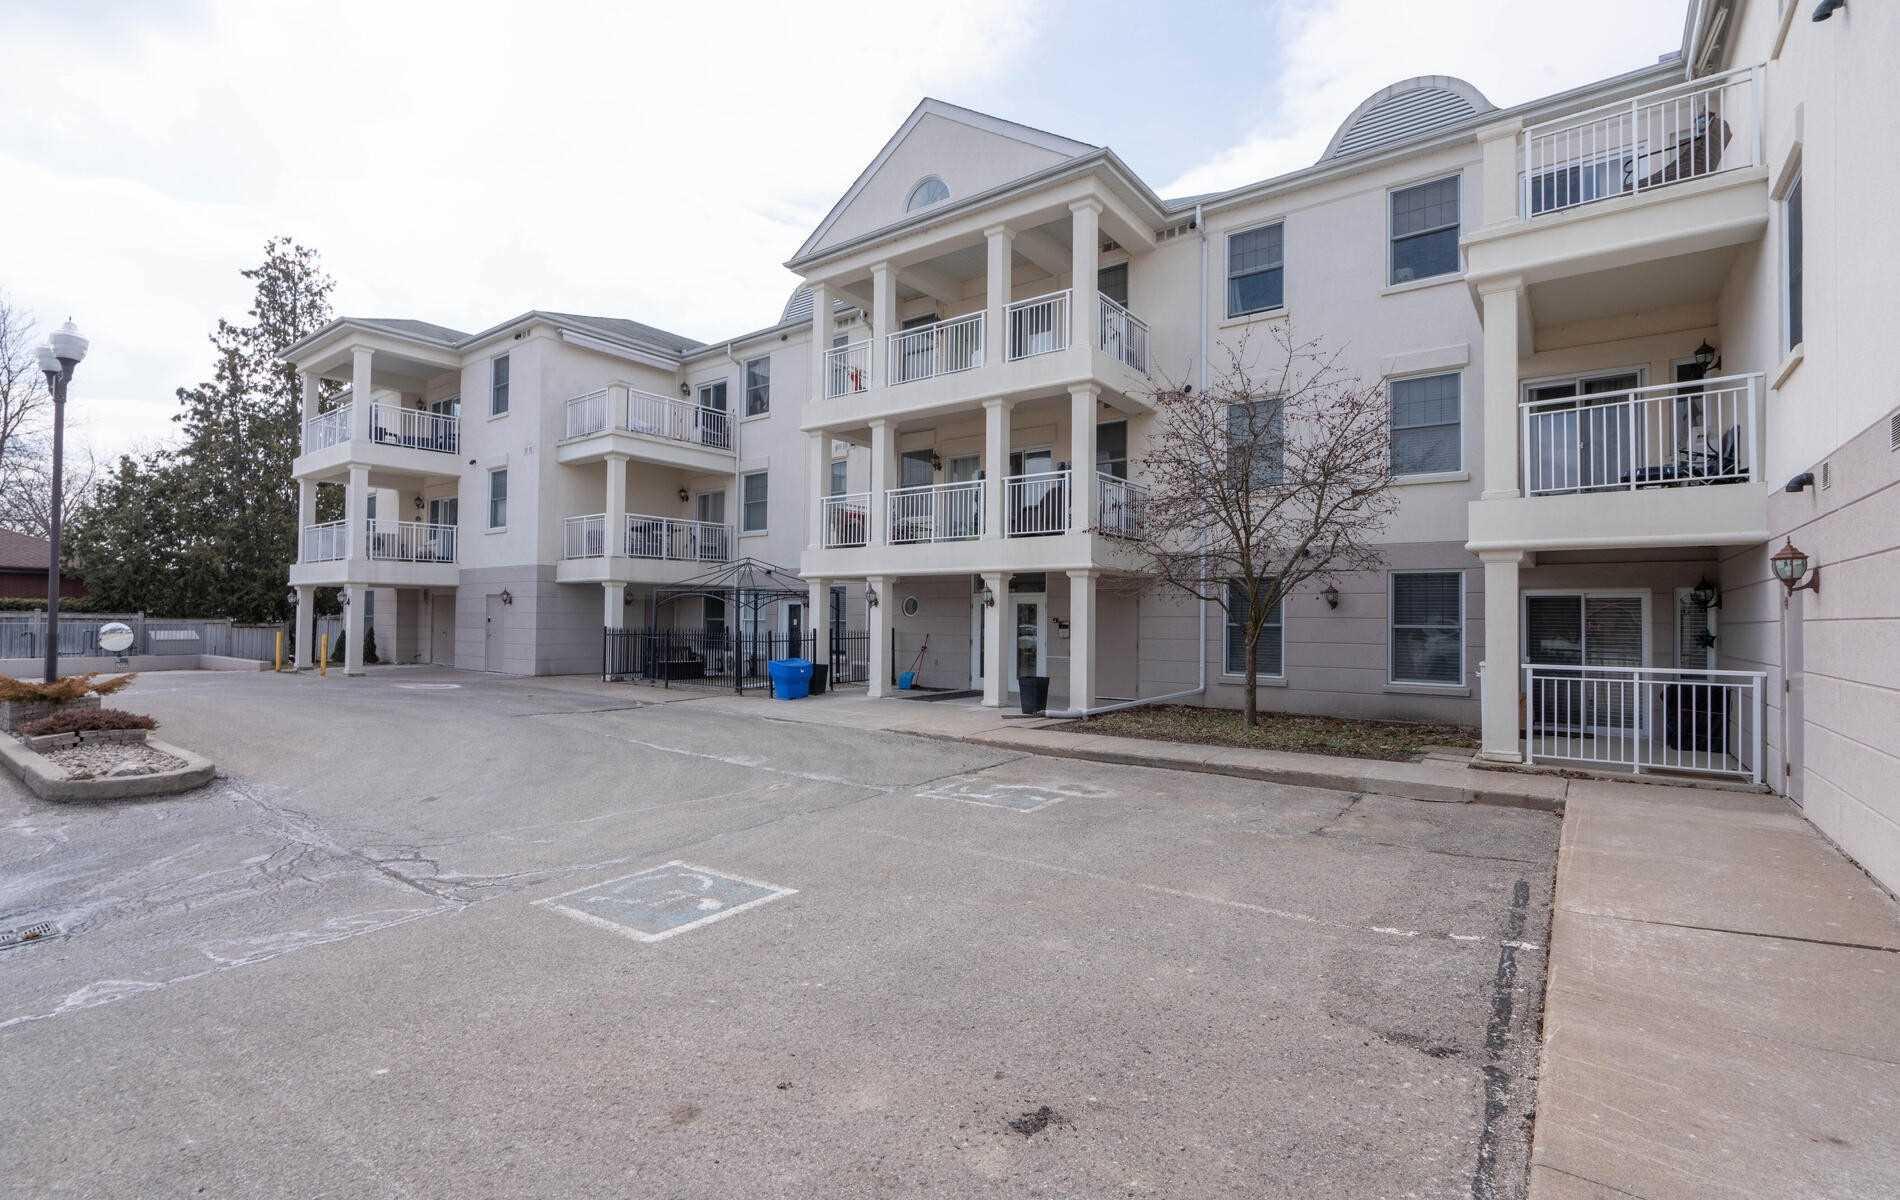 220 Main St, Uxbridge, Ontario L9P 0B6, 2 Bedrooms Bedrooms, ,2 BathroomsBathrooms,Condo Apt,For Sale,Main,N5156525